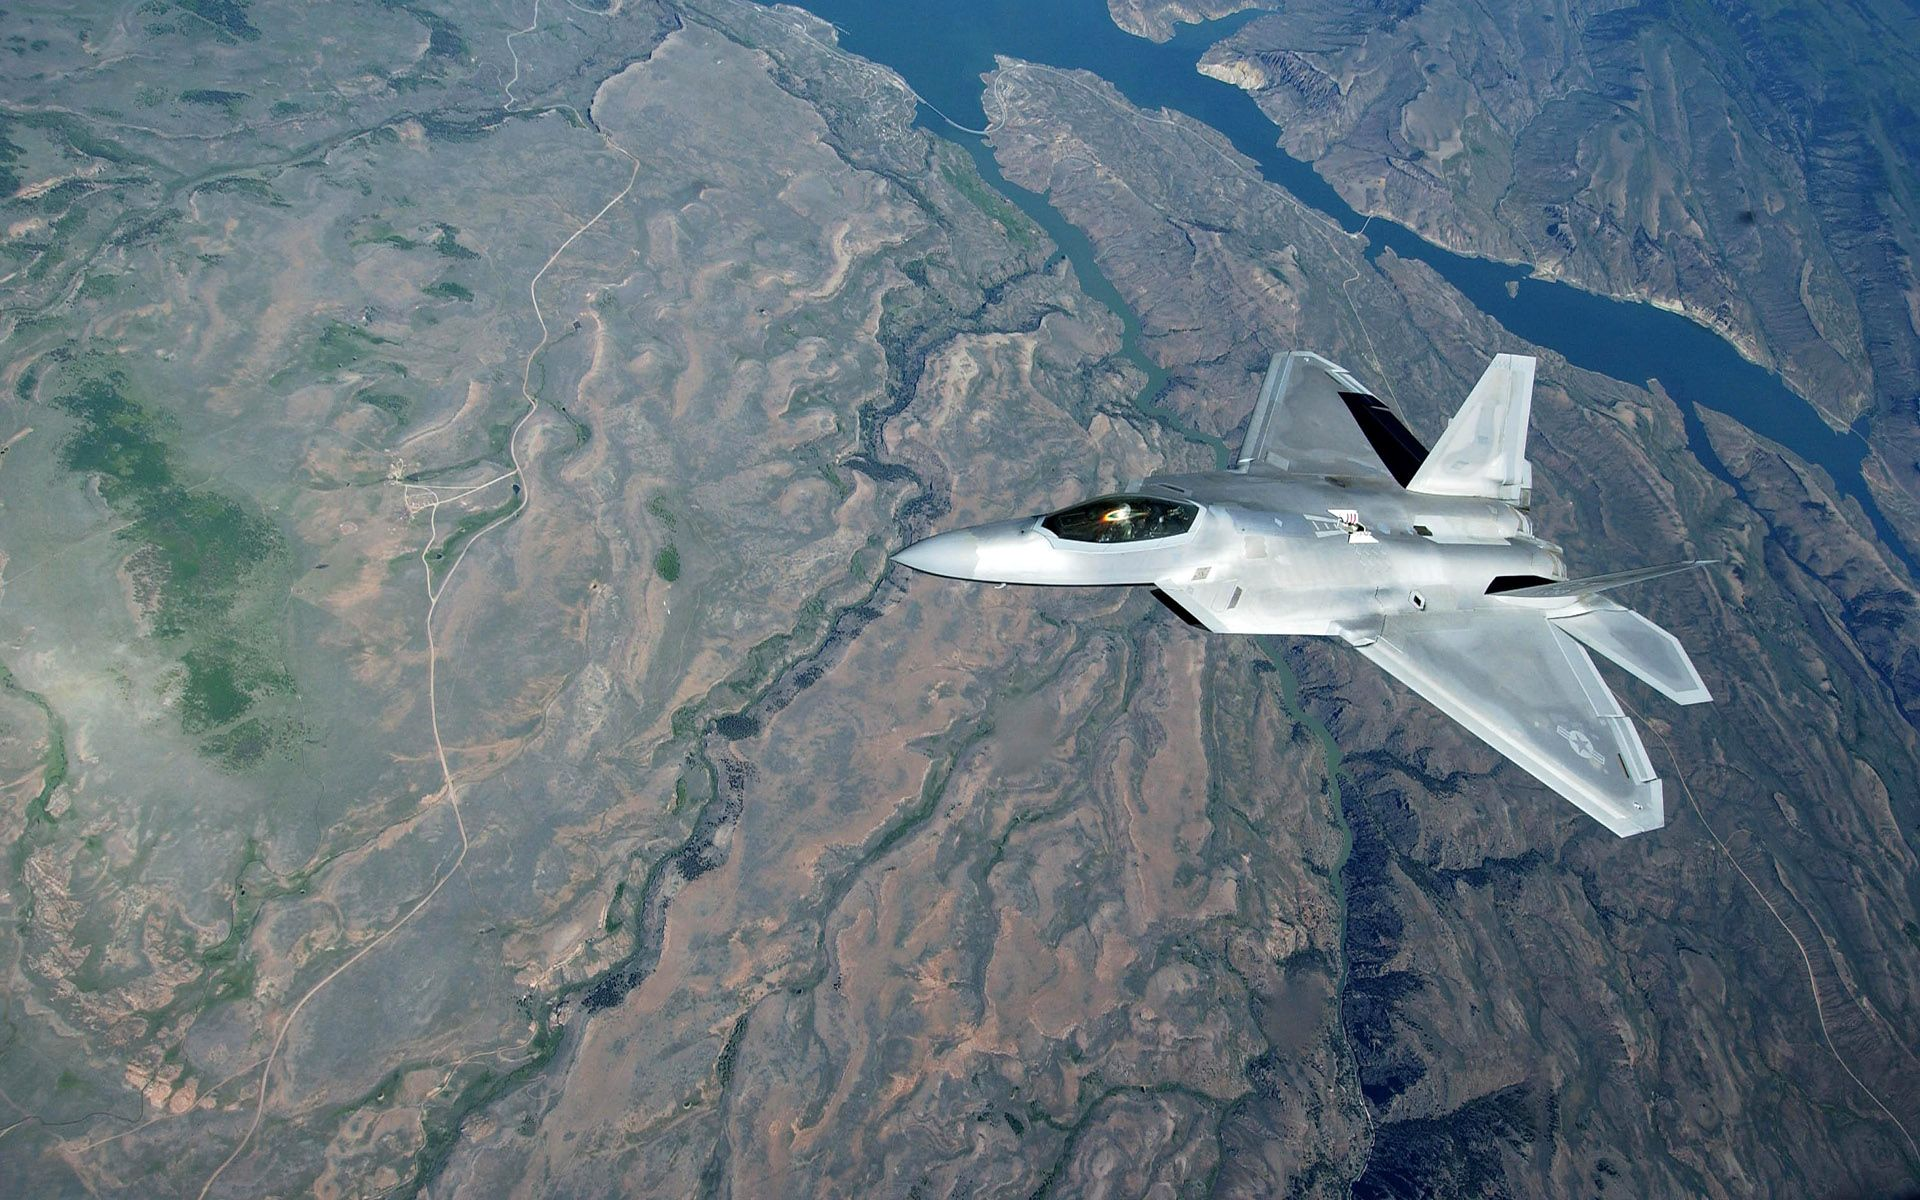 Aeromobile Aeronave Aeronef Air Aircraft Fly Jet